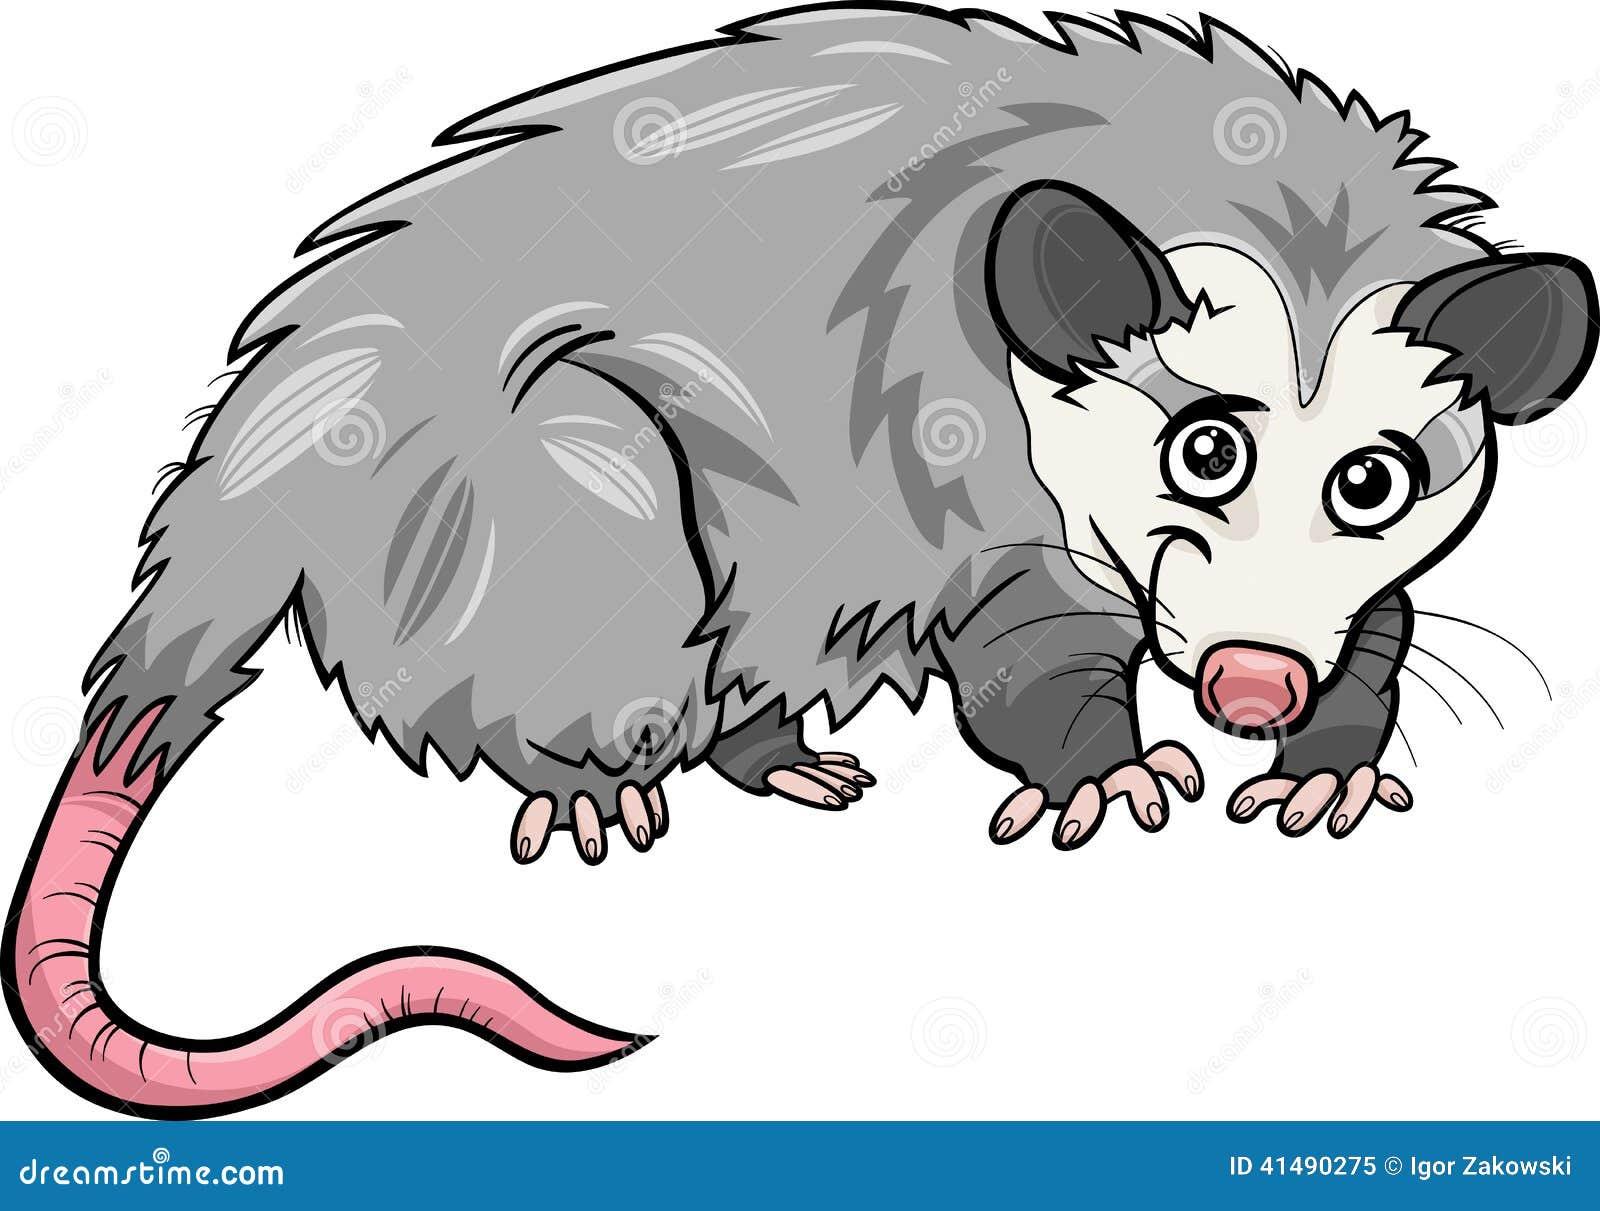 Opossum Animal Cartoon Illustration Stock Vector - Image ...